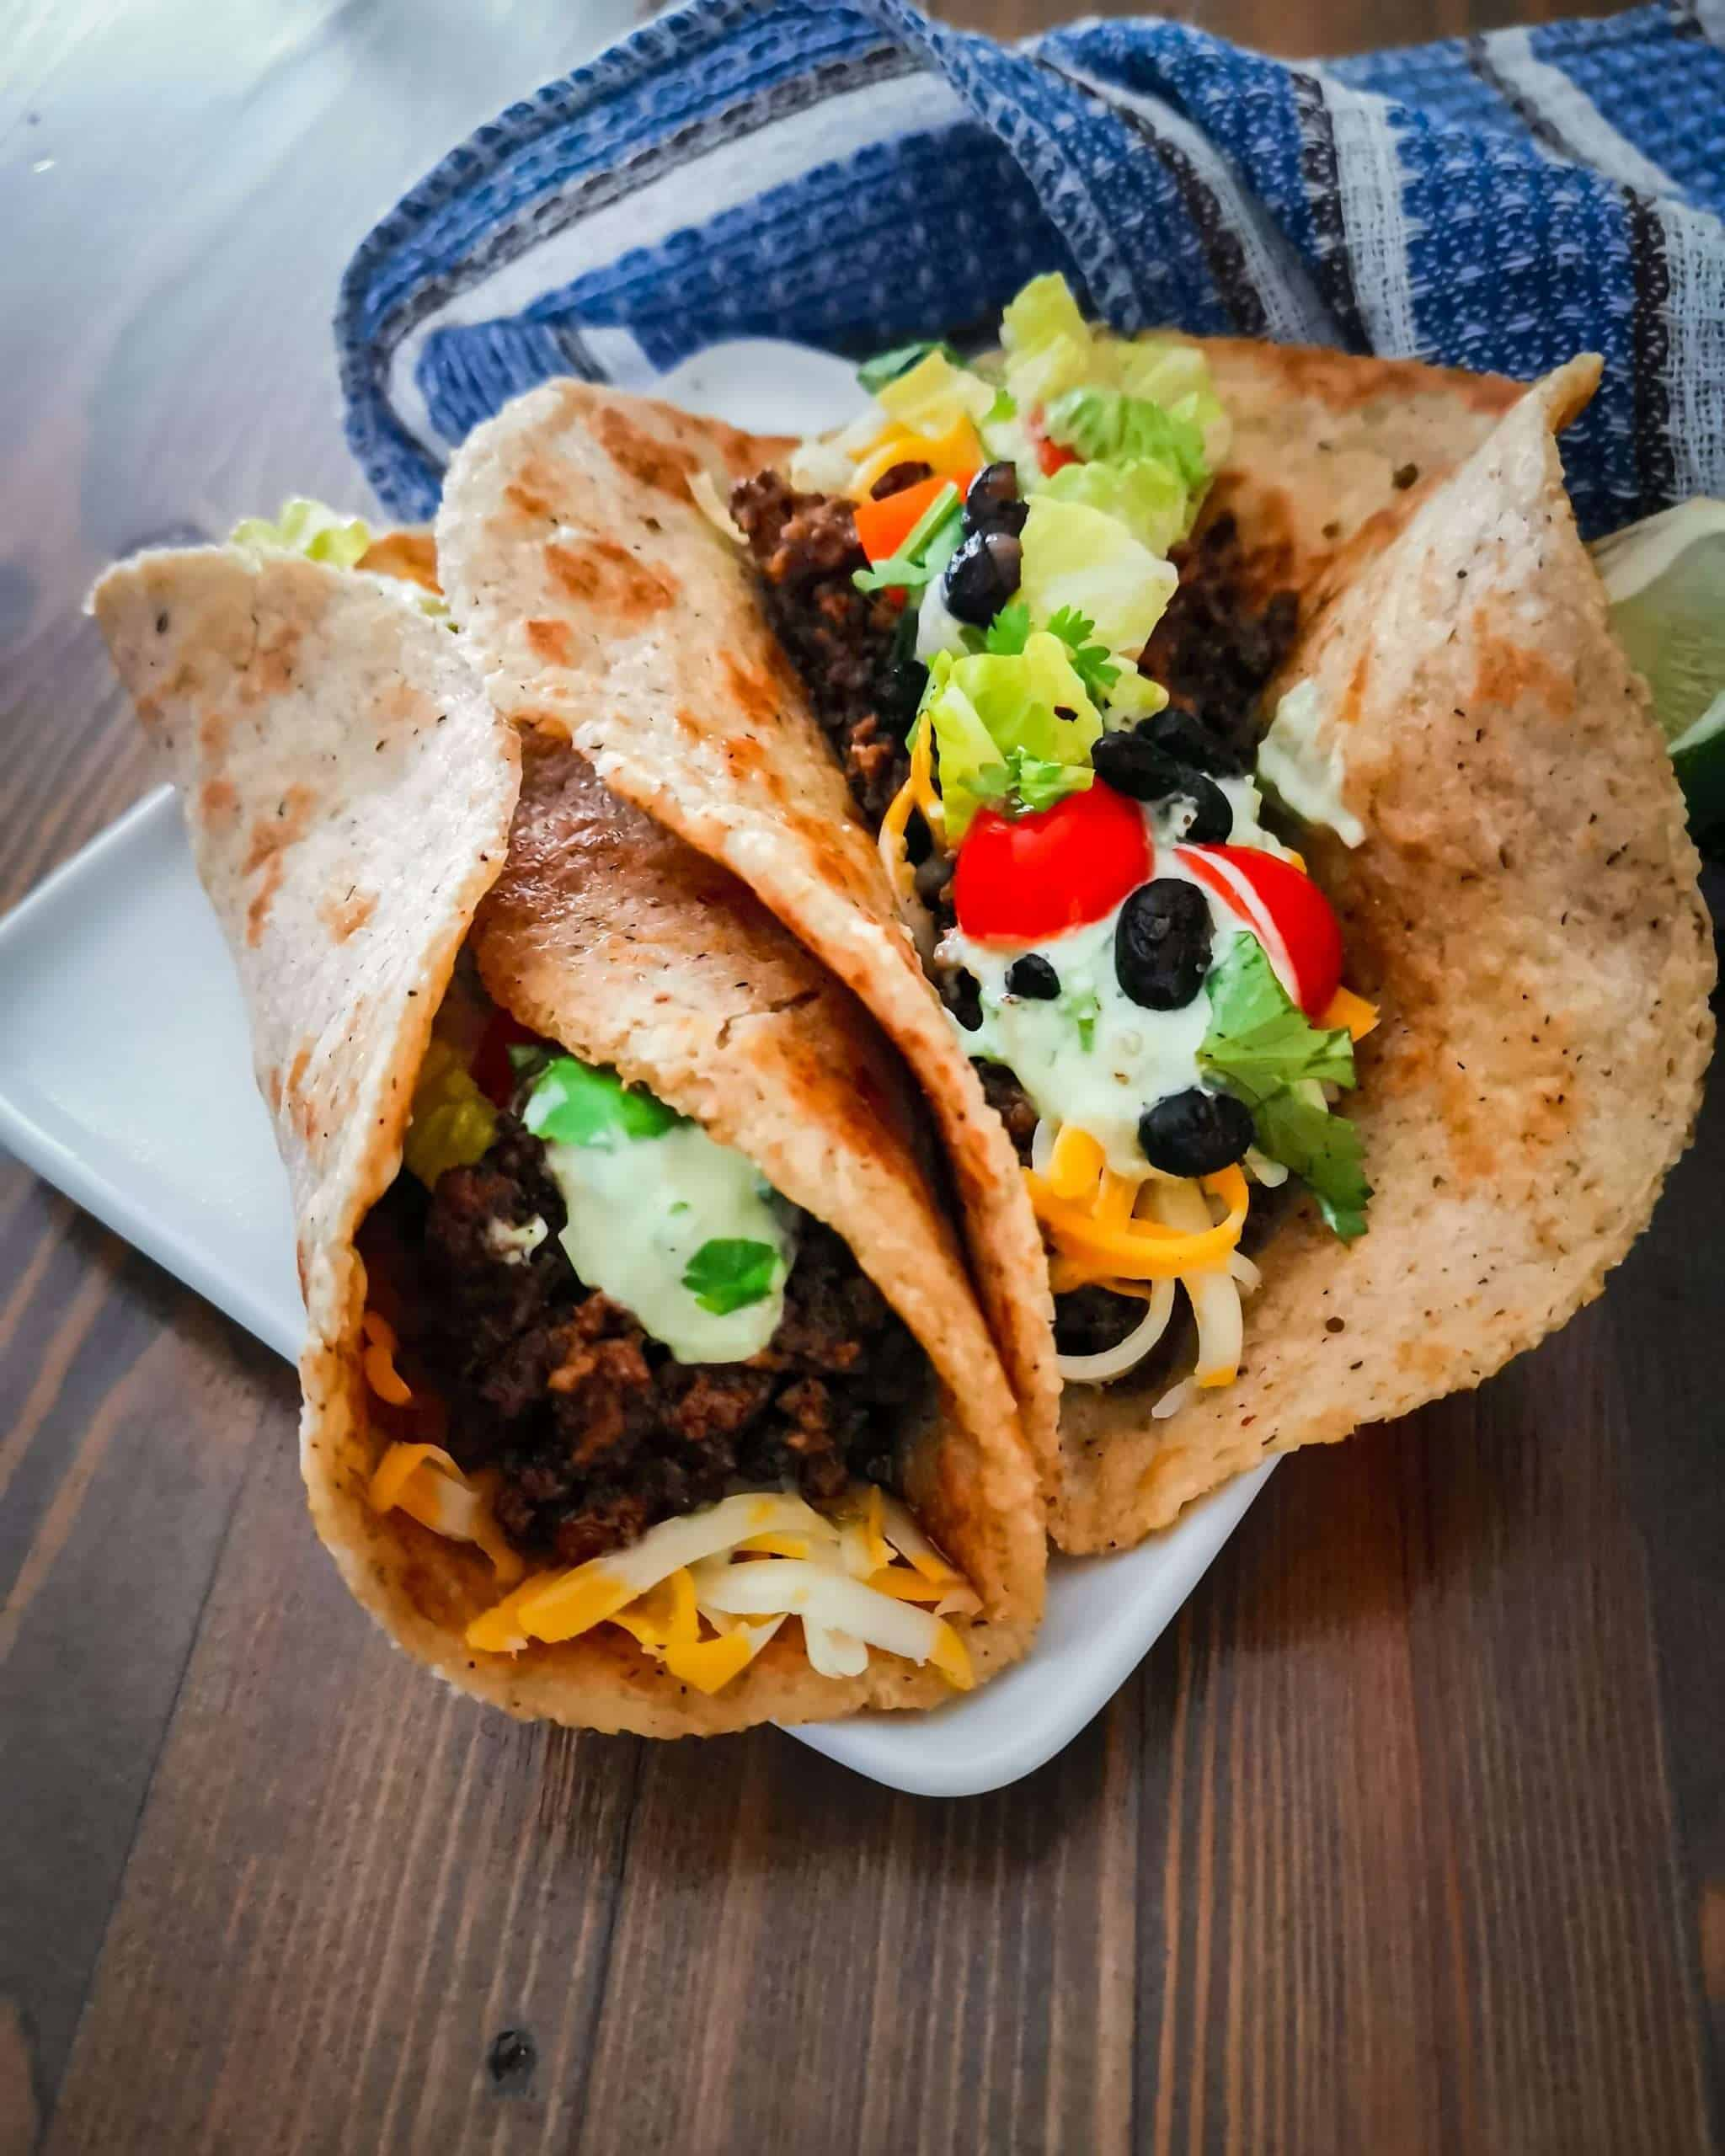 Keto tortilla wrapped around tacos